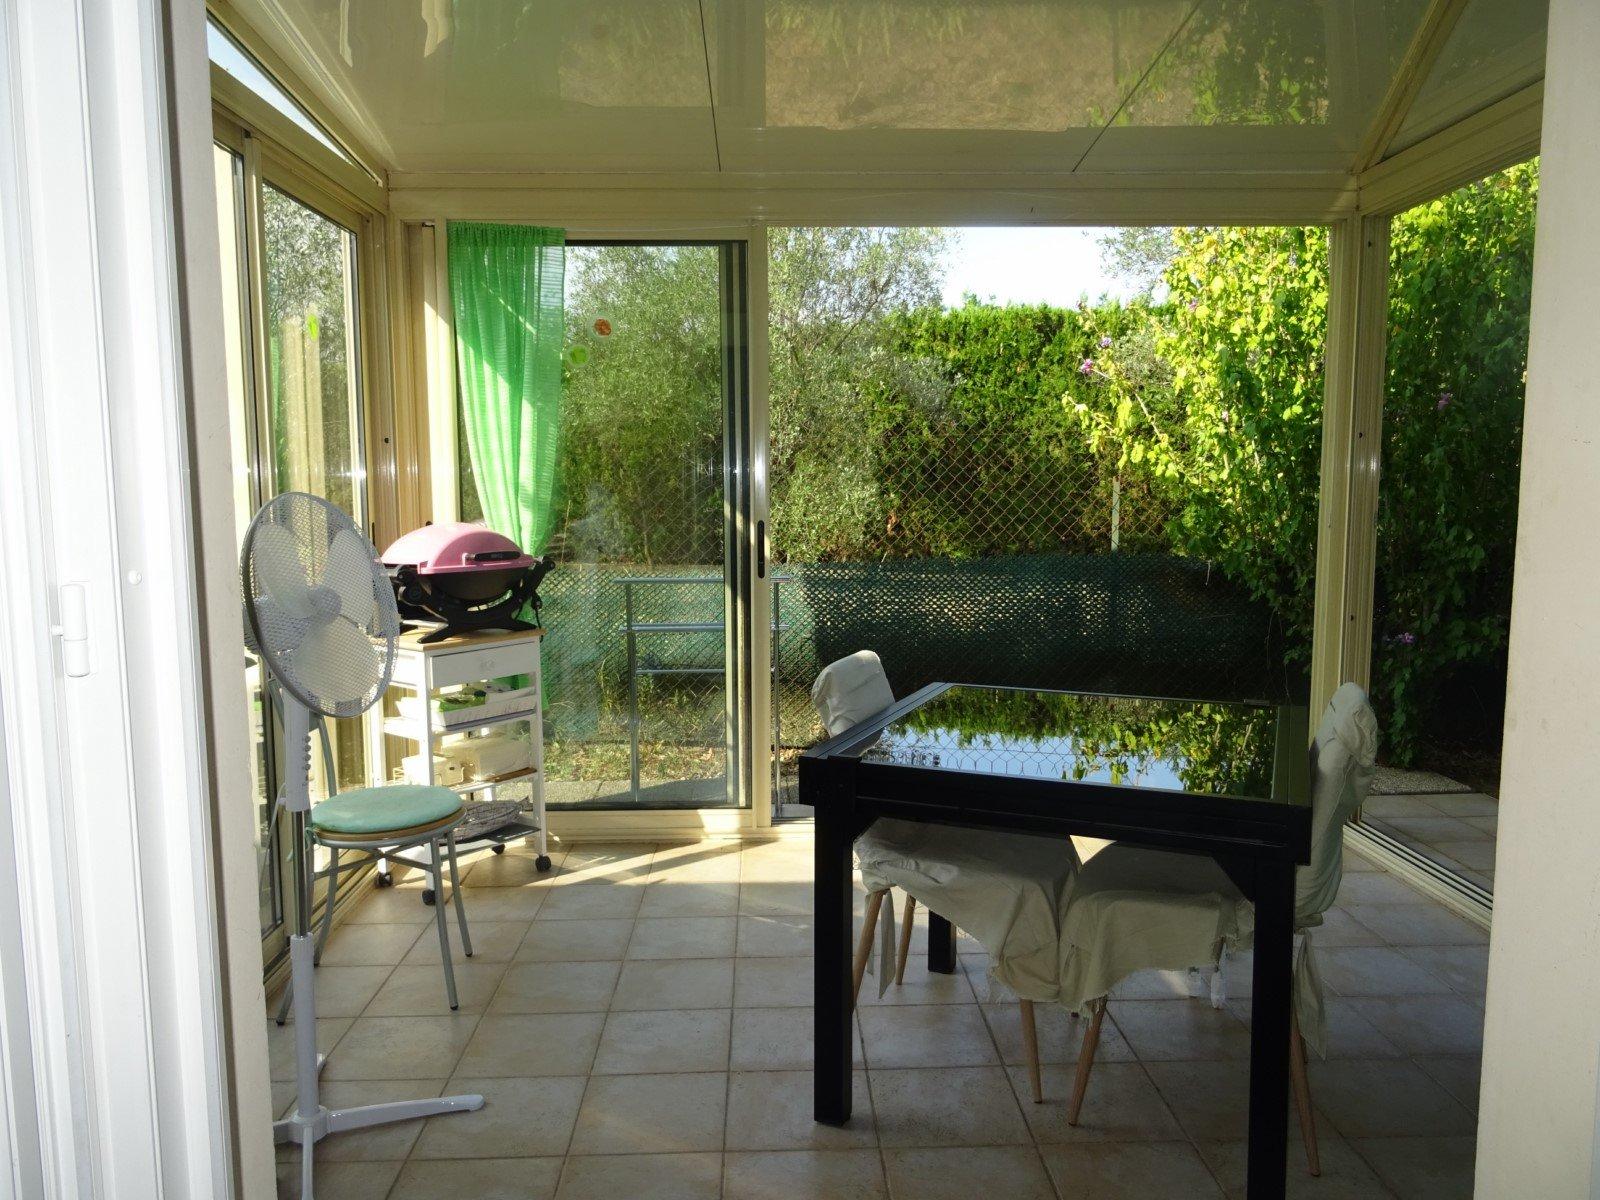 maison 110 m² avec piscine